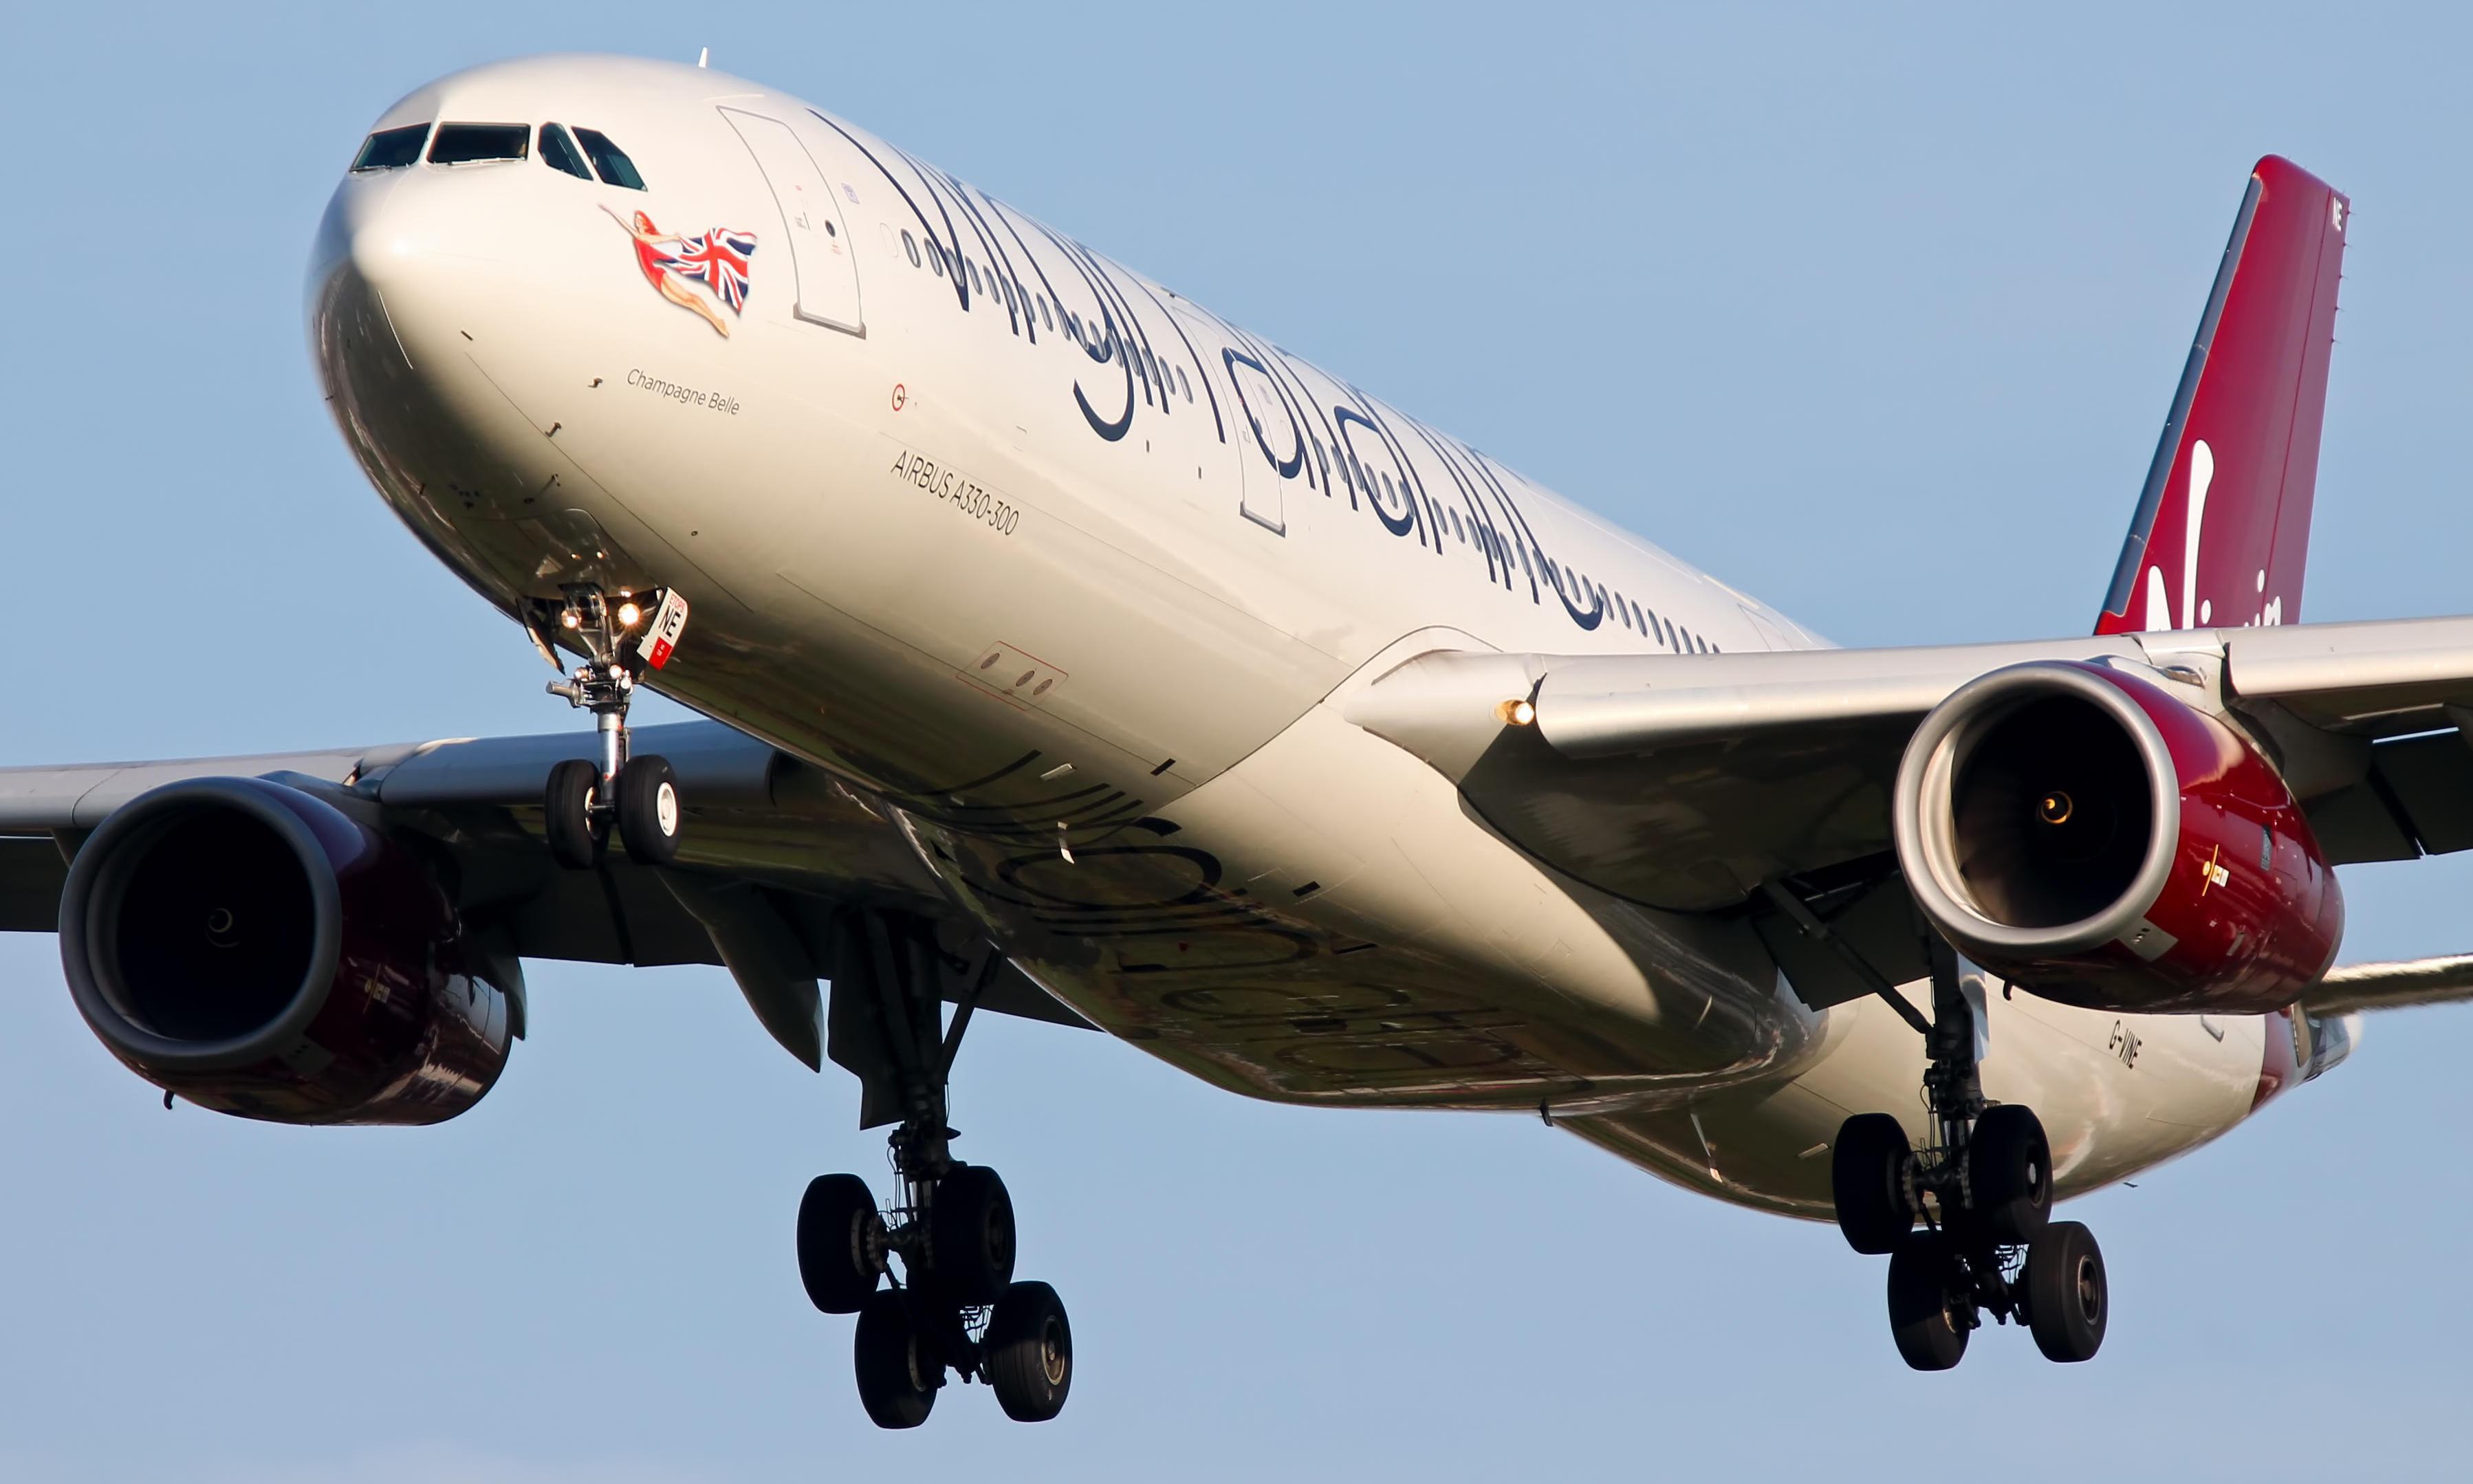 Virgin Atlantic plans to take on British Airways for Heathrow flights